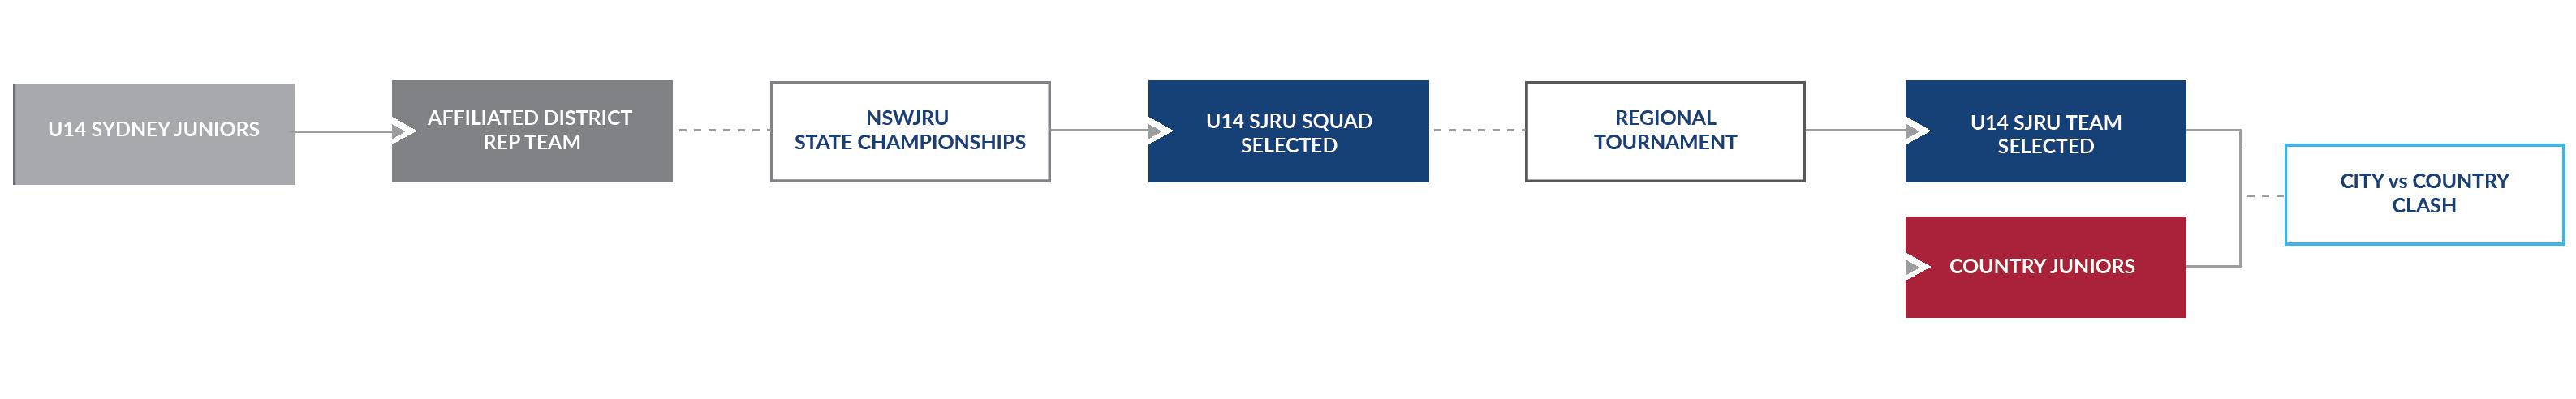 sjru_junior-pathways_u14